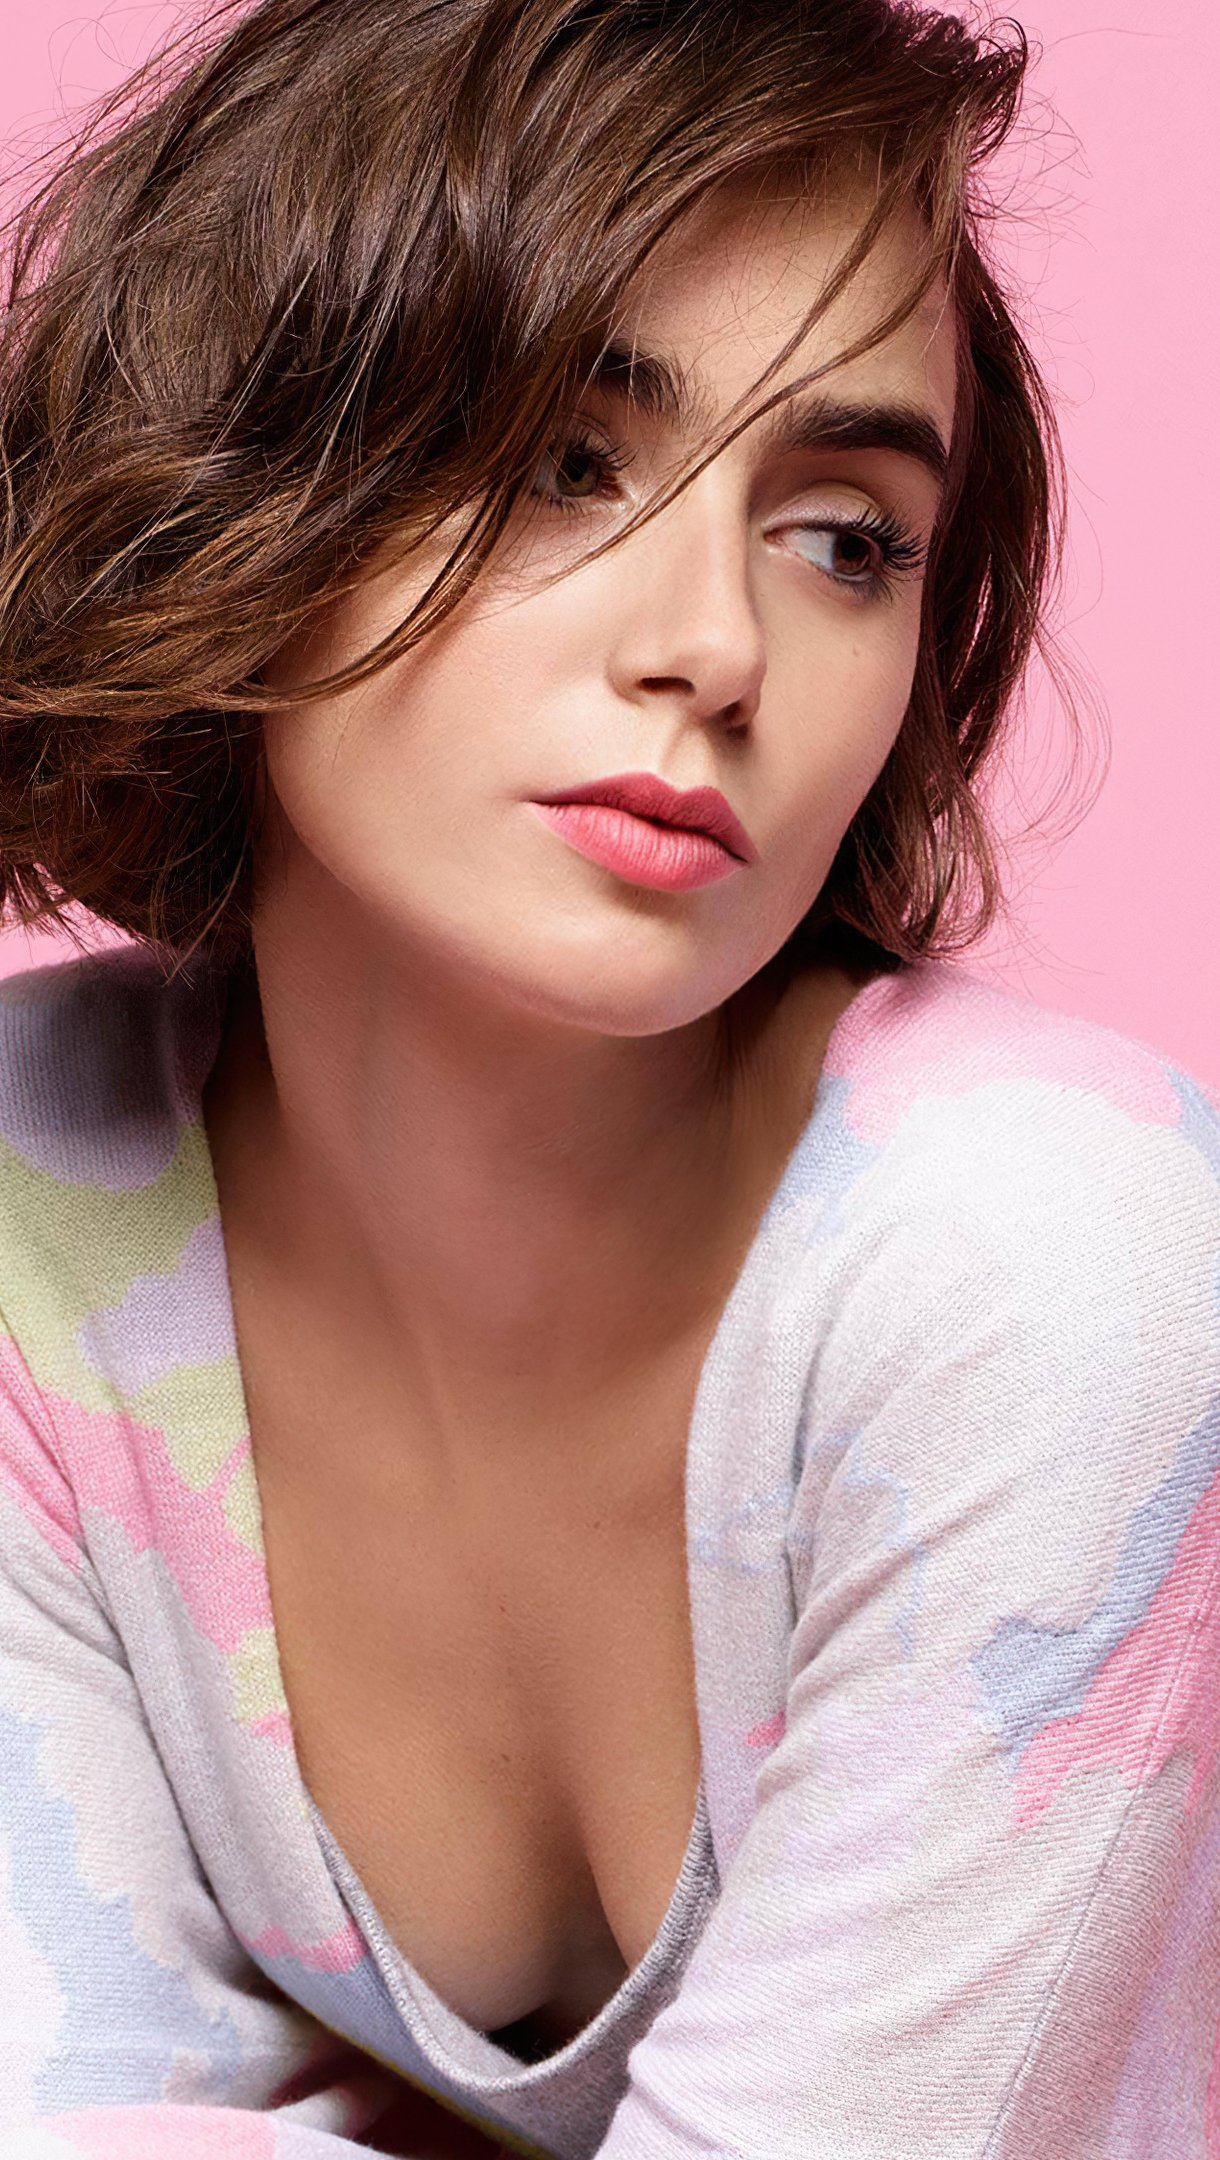 Fondos de pantalla Lily Collins cabello corto Vertical